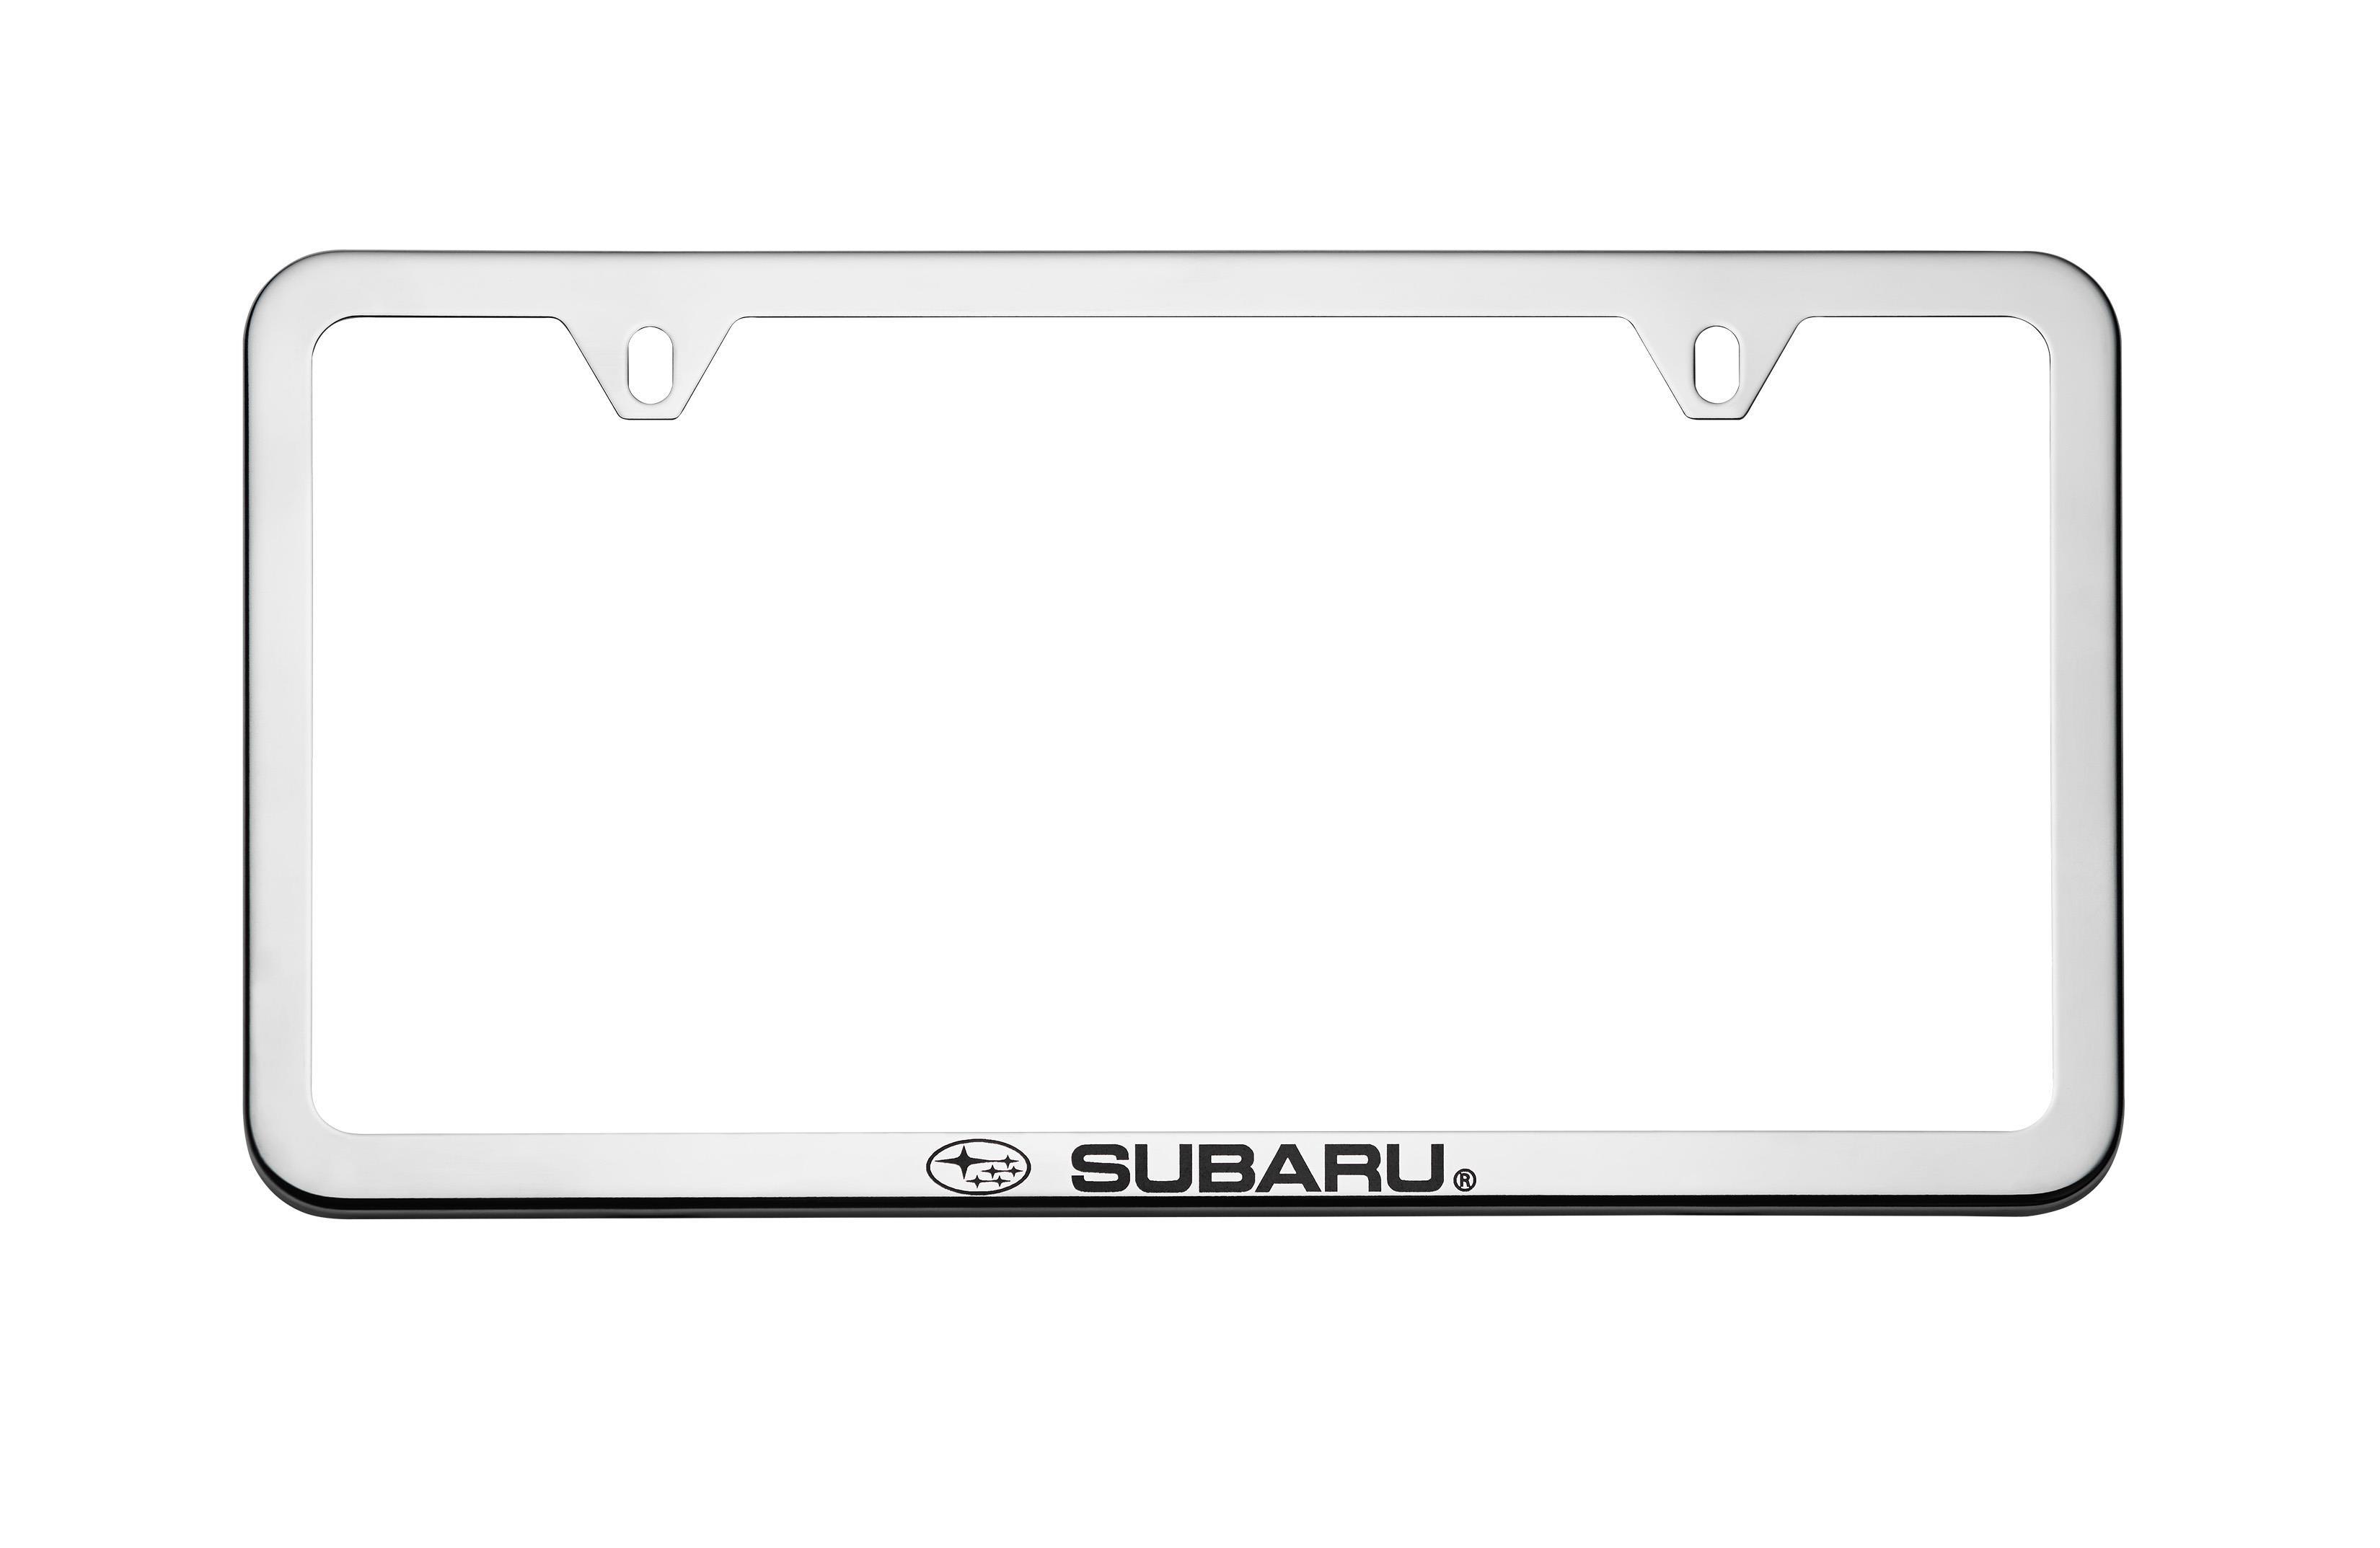 Subaru Impreza Subaru License Plate Frame Polished